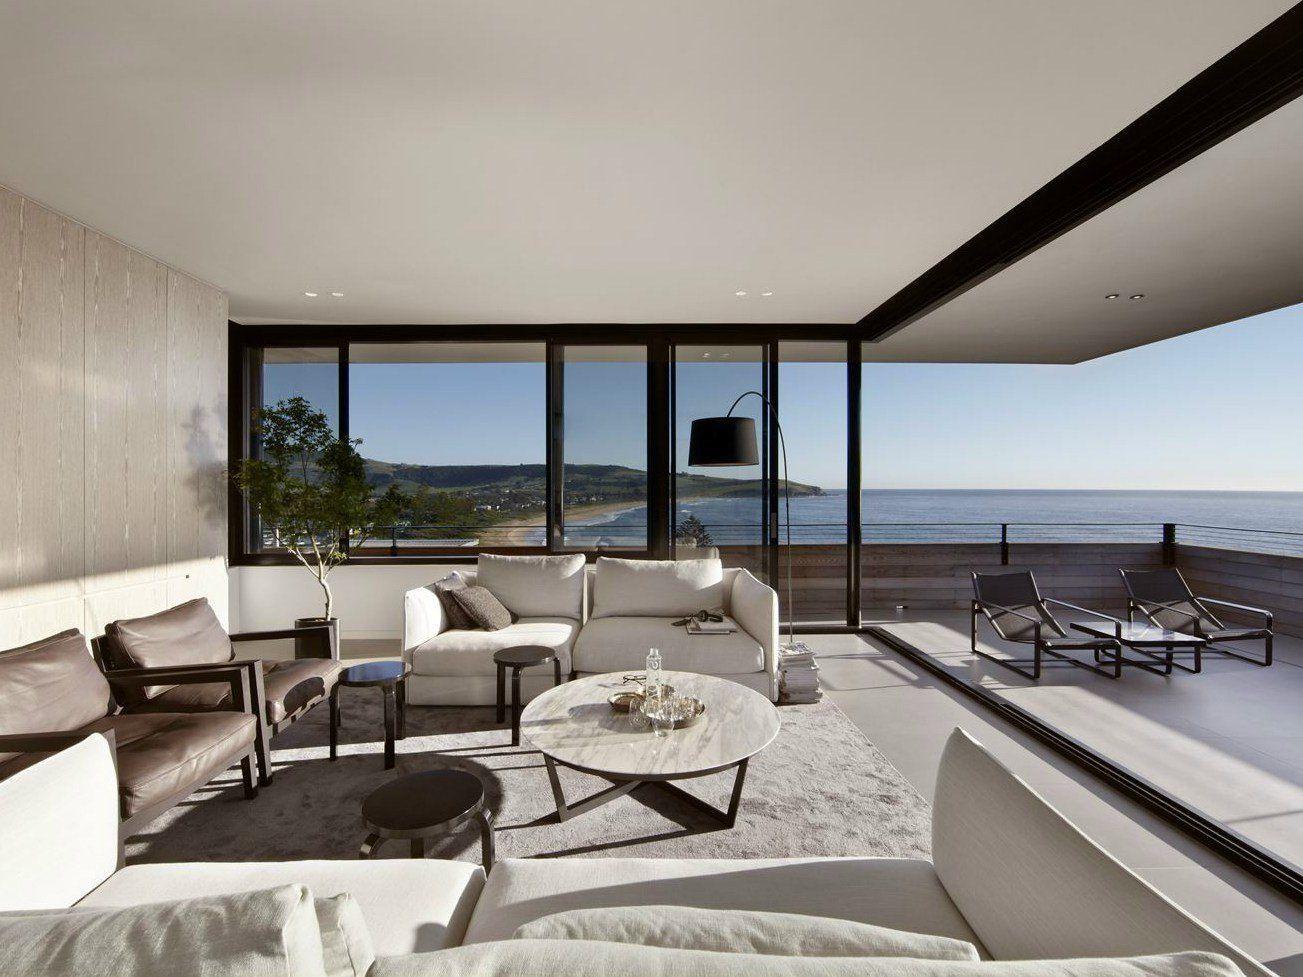 Australia: Lamble Residence by Smart Design Studio